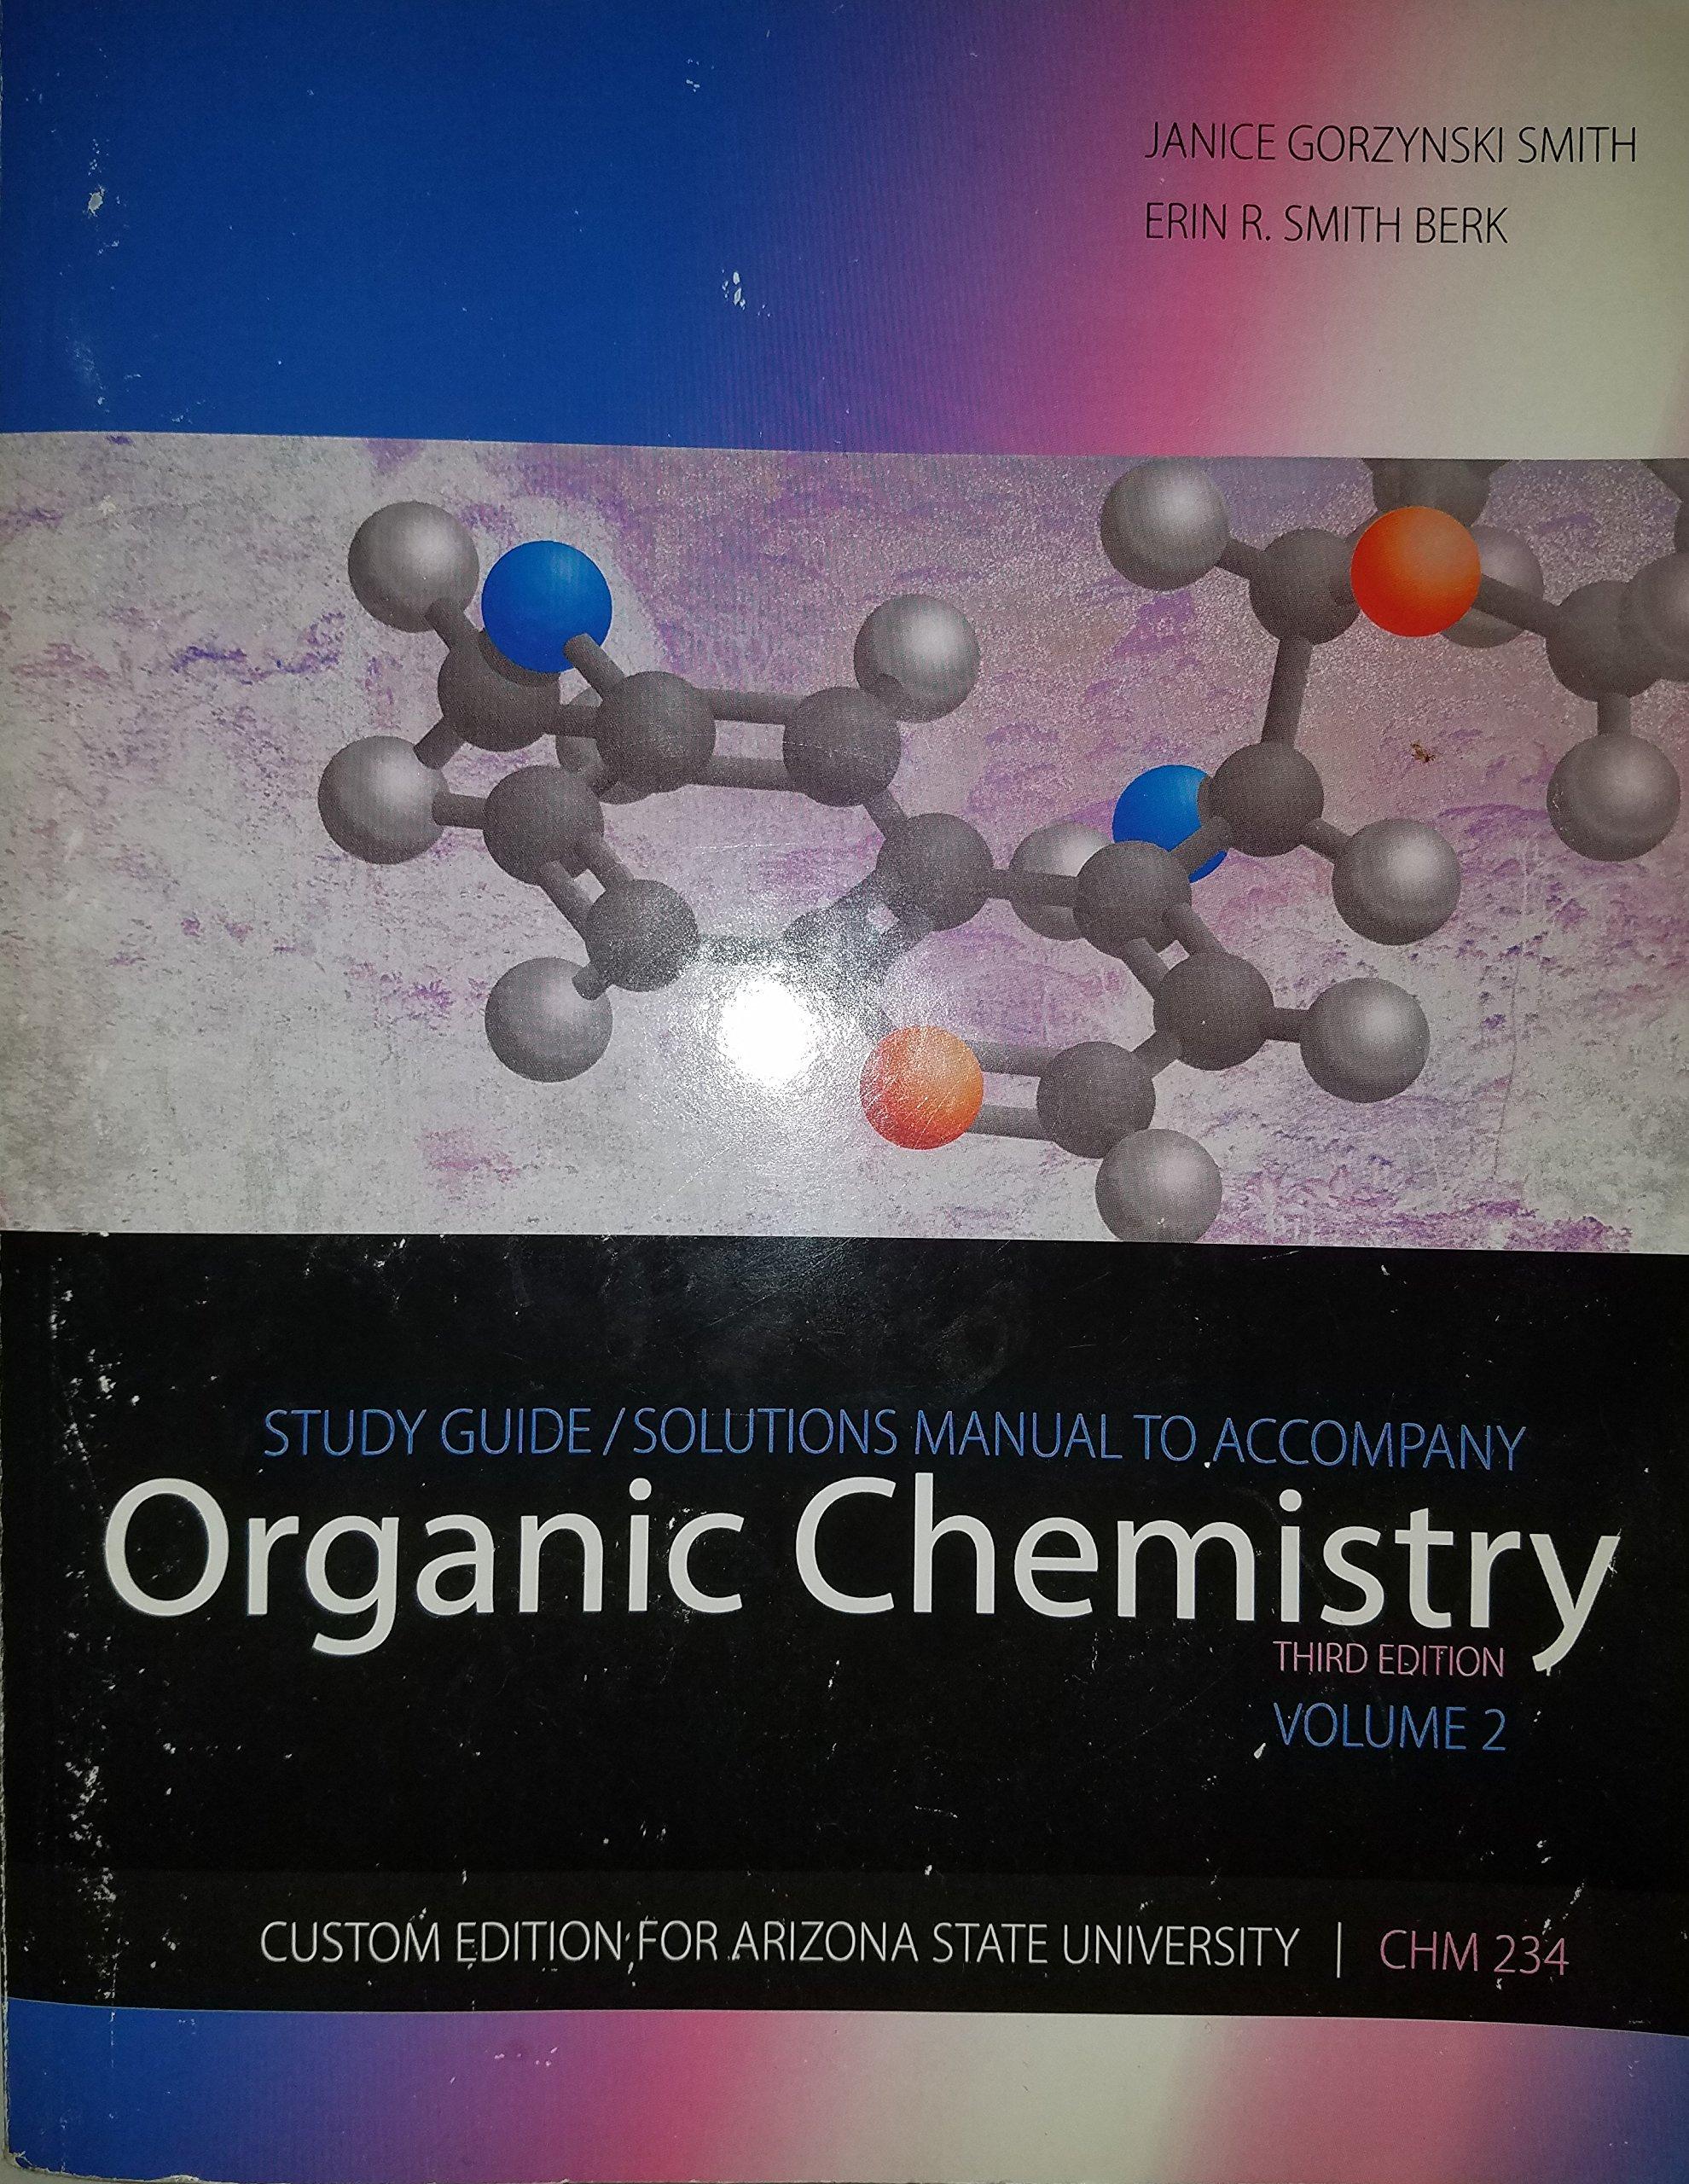 Organic Chemistry ASU Custom Edition Study Guide/Solutions Manual: Janice  Gorzynski Smith: 9780077489885: Amazon.com: Books